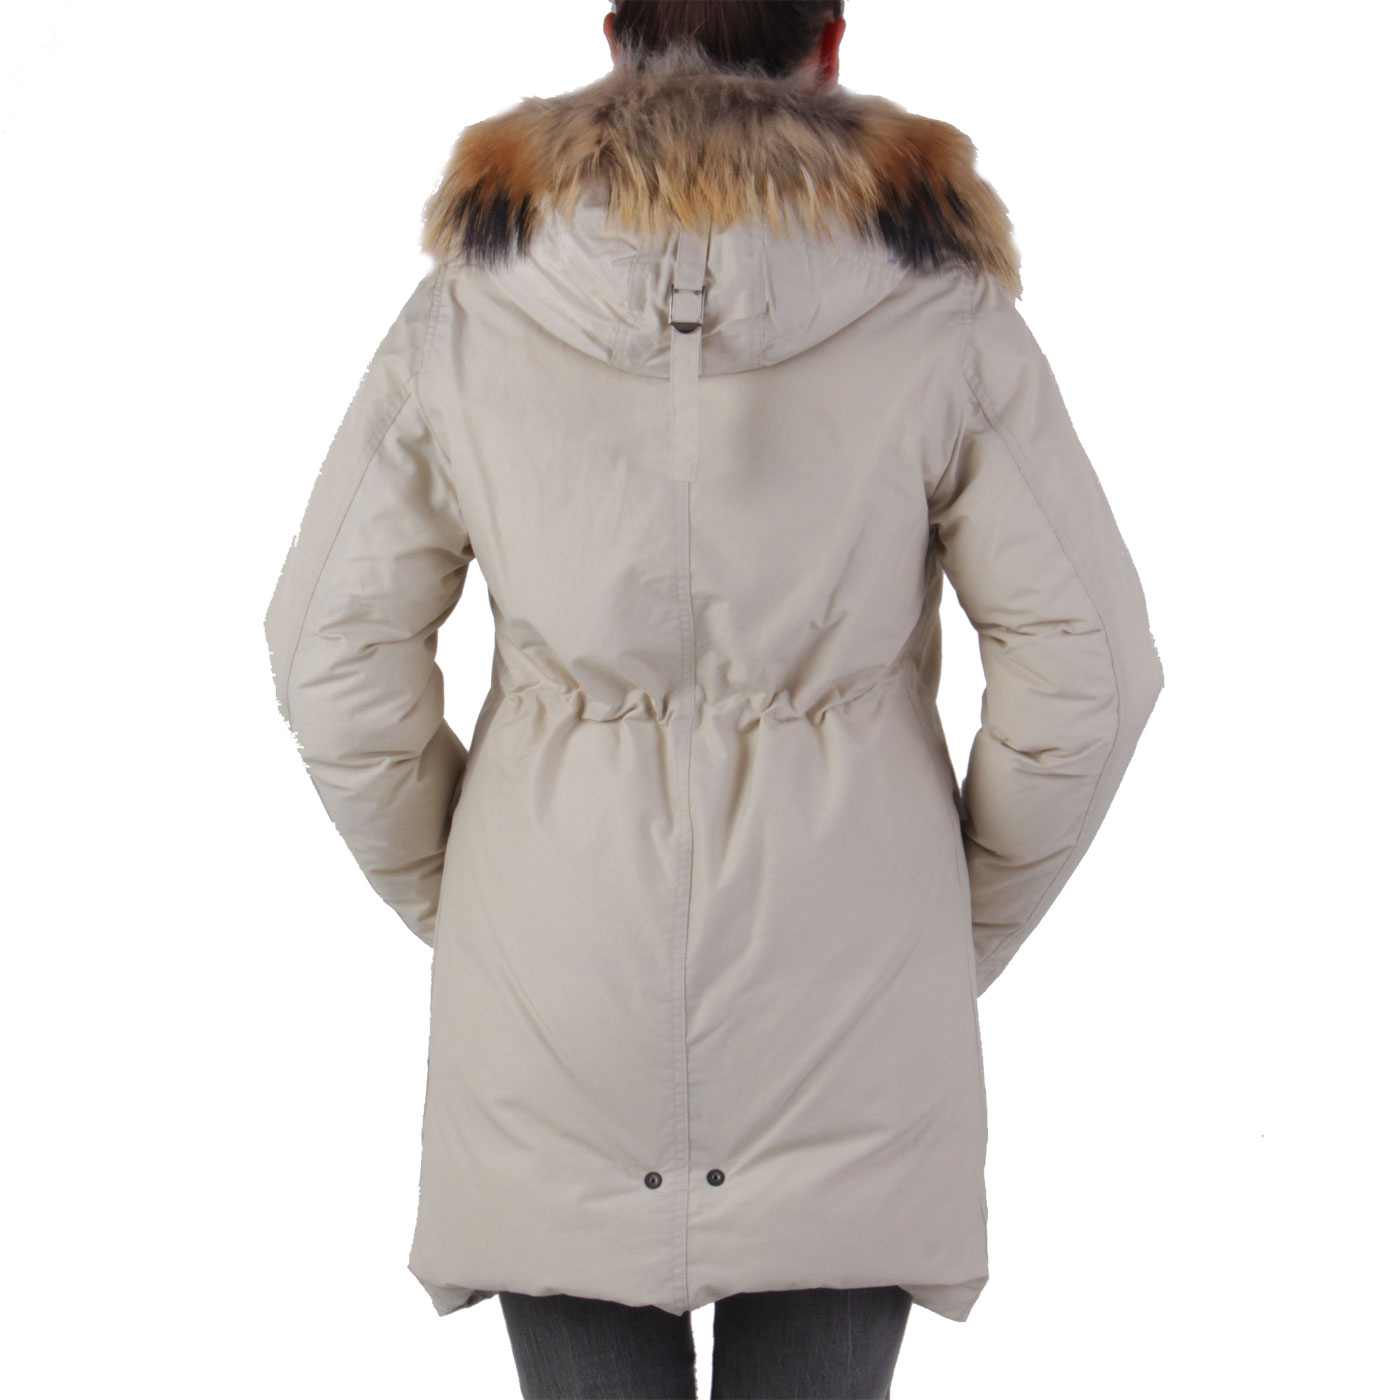 blauer usa damen winter daunen parka mantel jacke limited beige bld03045 gr e s ebay. Black Bedroom Furniture Sets. Home Design Ideas